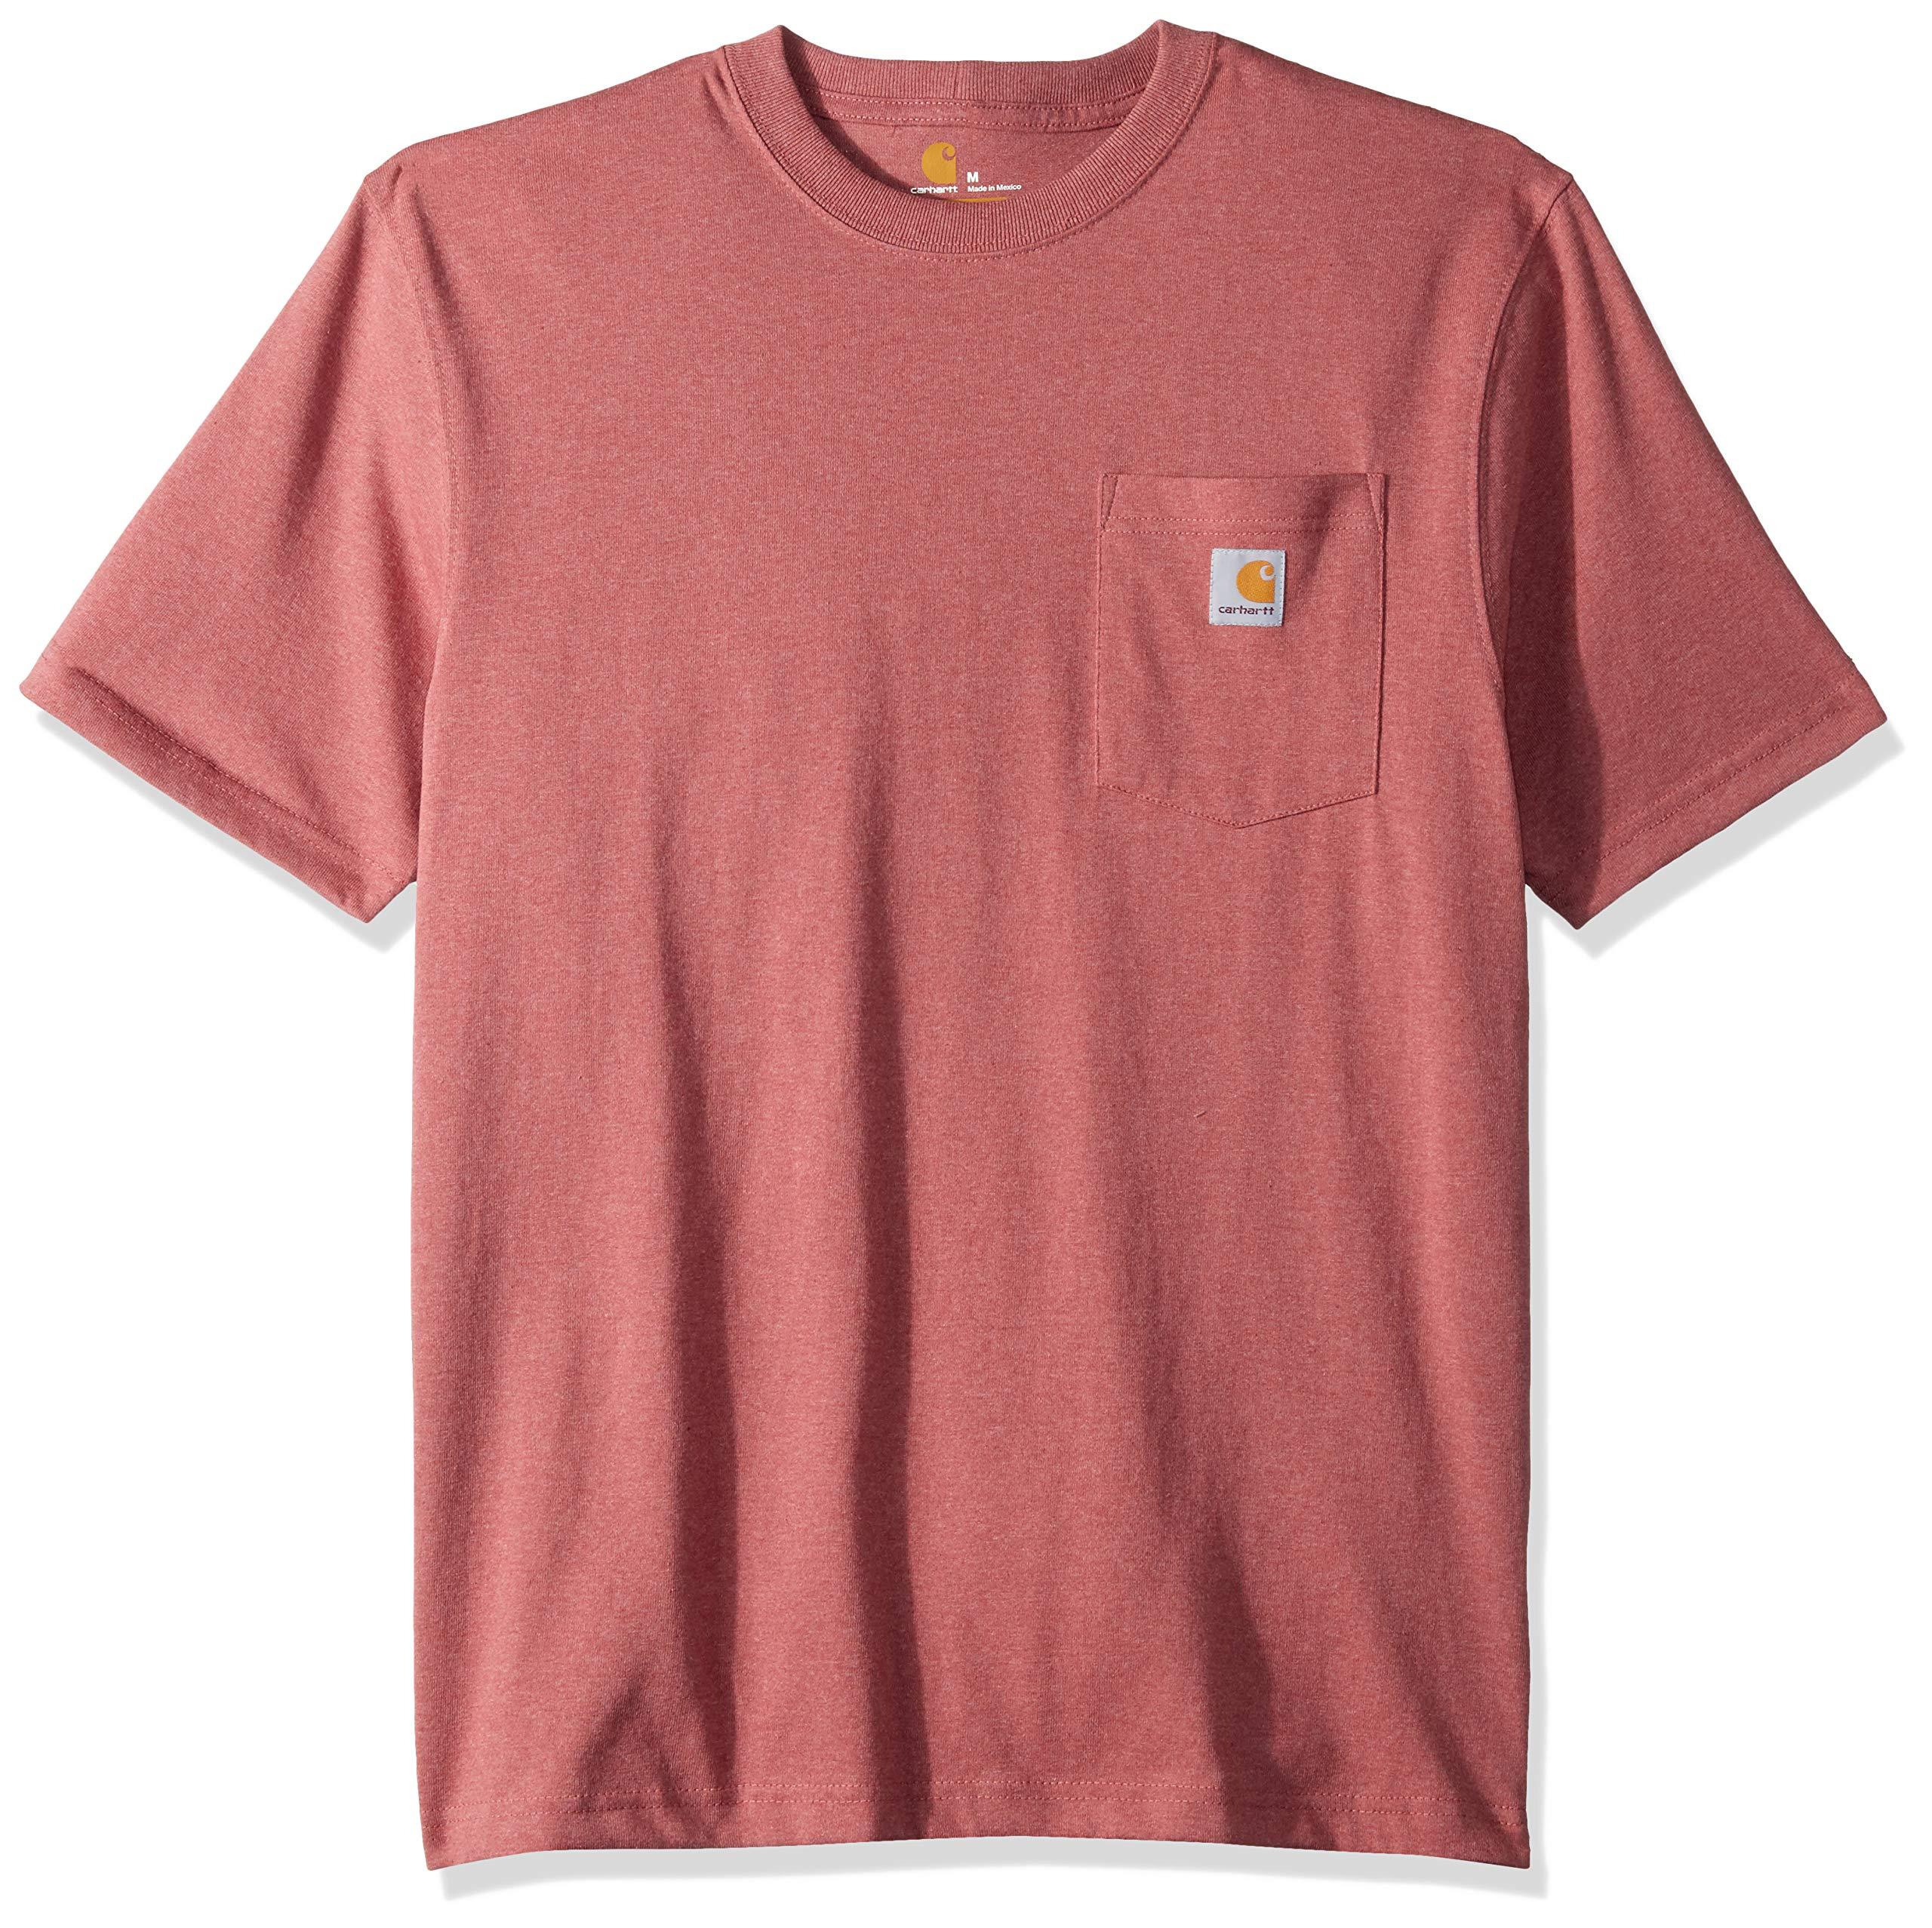 Carhartt Men's K87 Workwear Pocket Short Sleeve T-Shirt (Regular and Big & Tall Sizes), Brick dust heather, X-Large by Carhartt